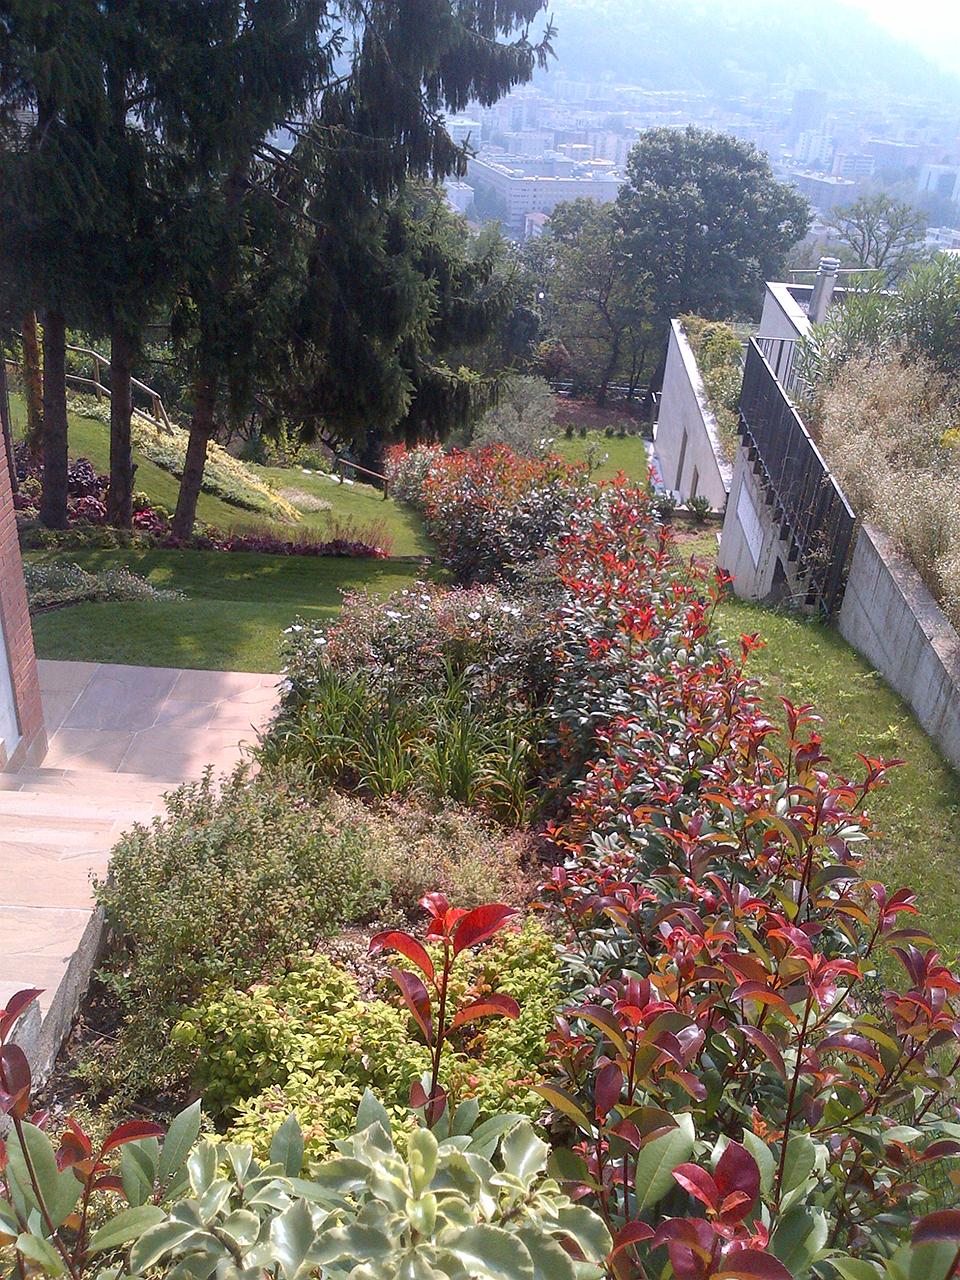 Landscapeinternational-Gallery-Giardini-12